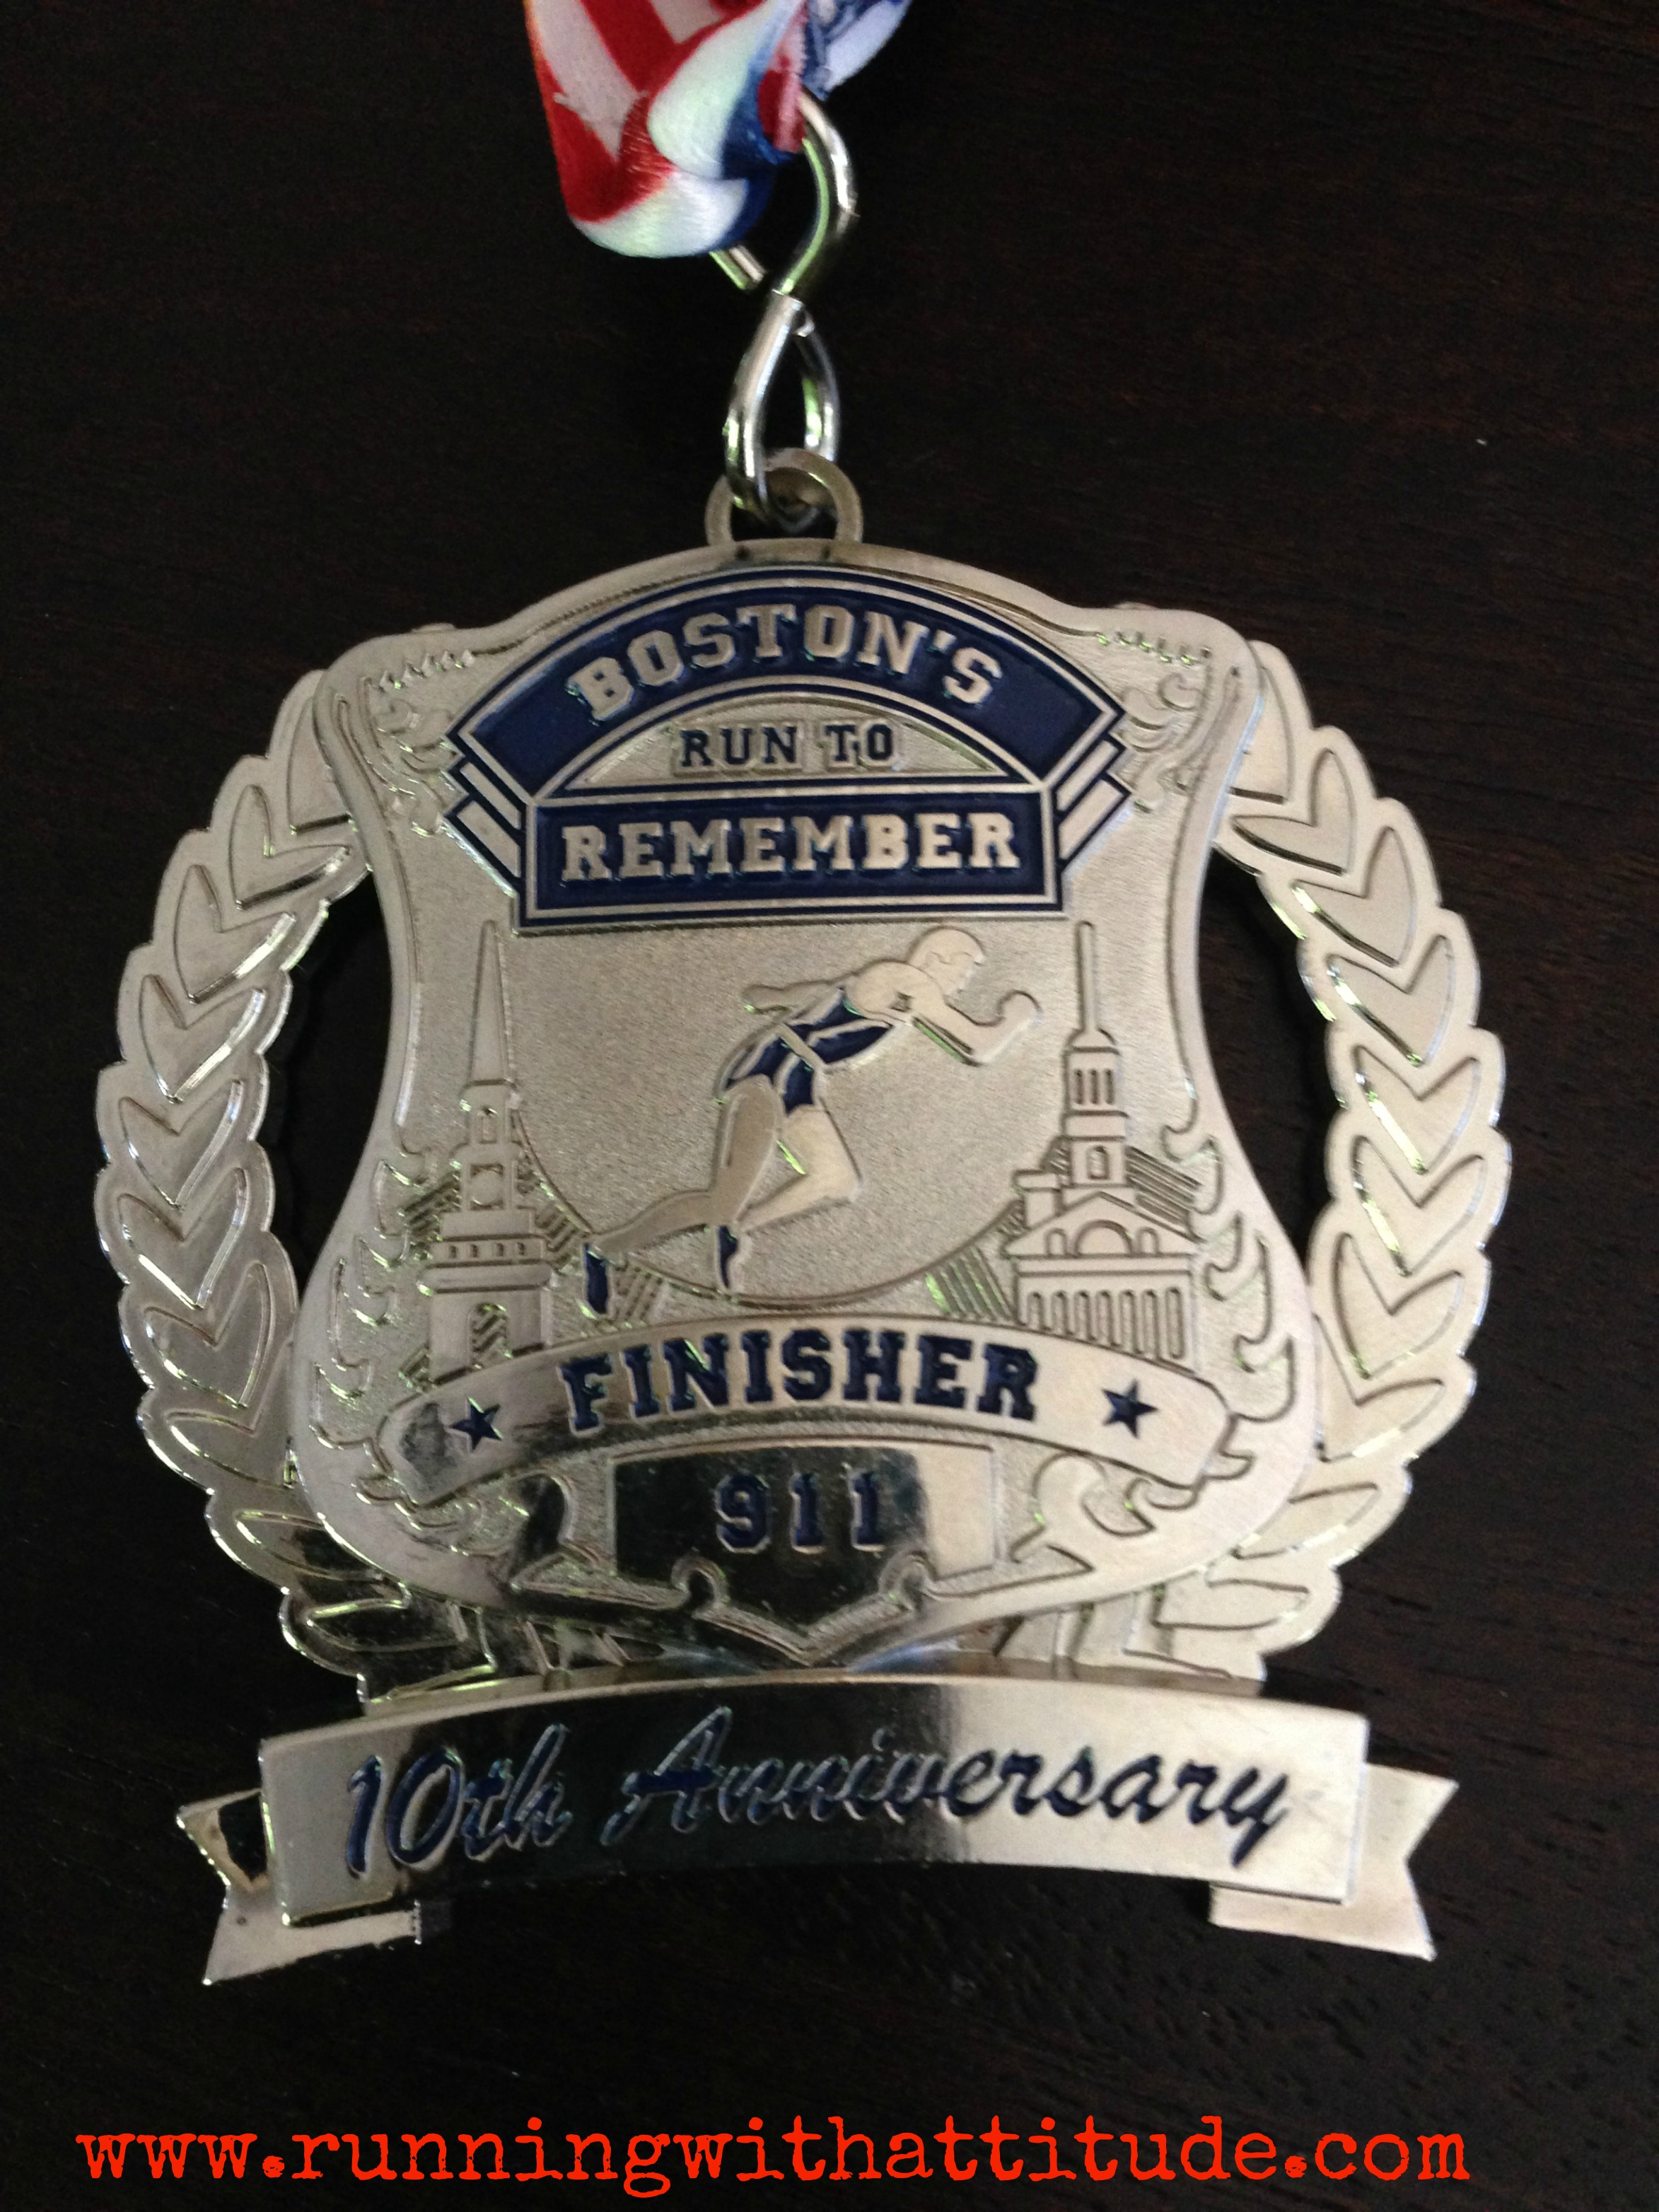 Boston's Run to Remember   AlzMassNH.org